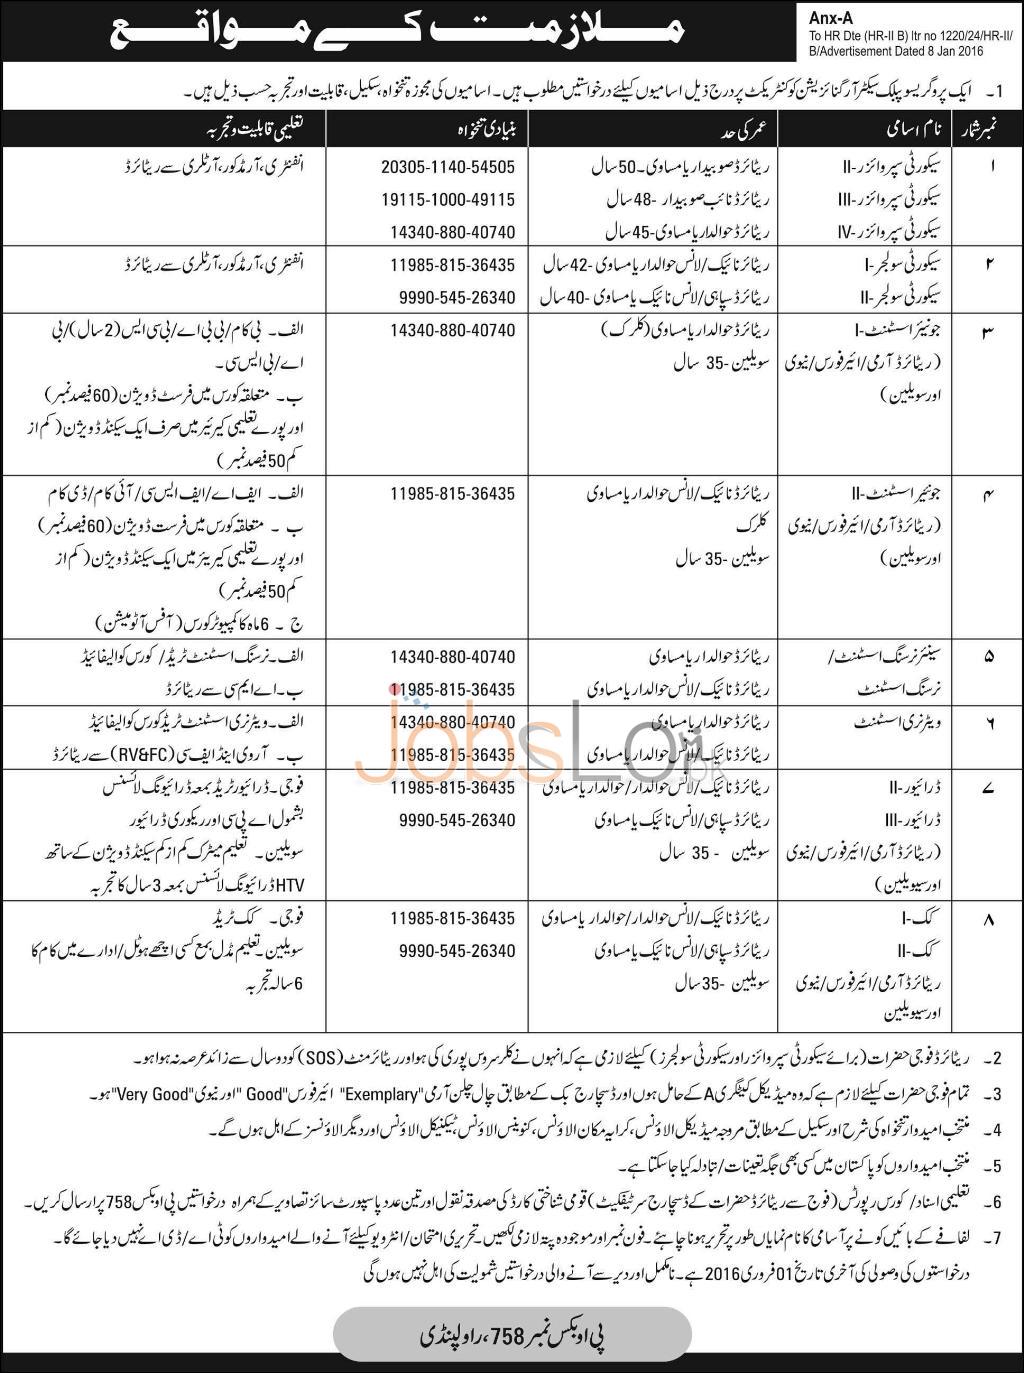 Public Sector Organization Rawalpindi 2016 Jobs